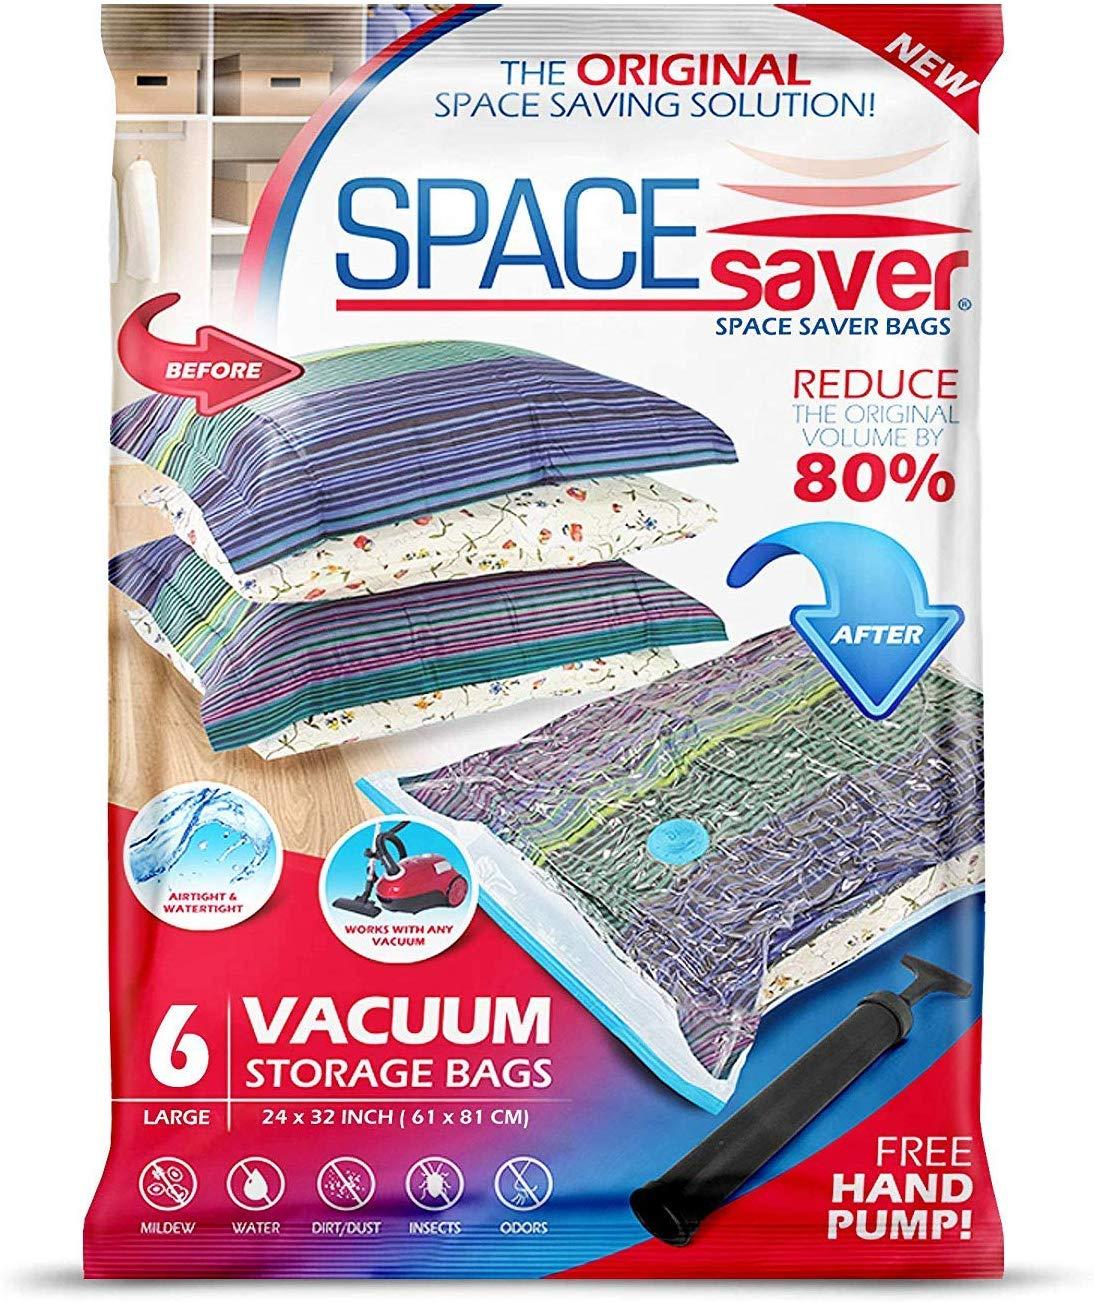 Spacesaver Premium Reusable Vacuum Storage Bags with Hand Pump